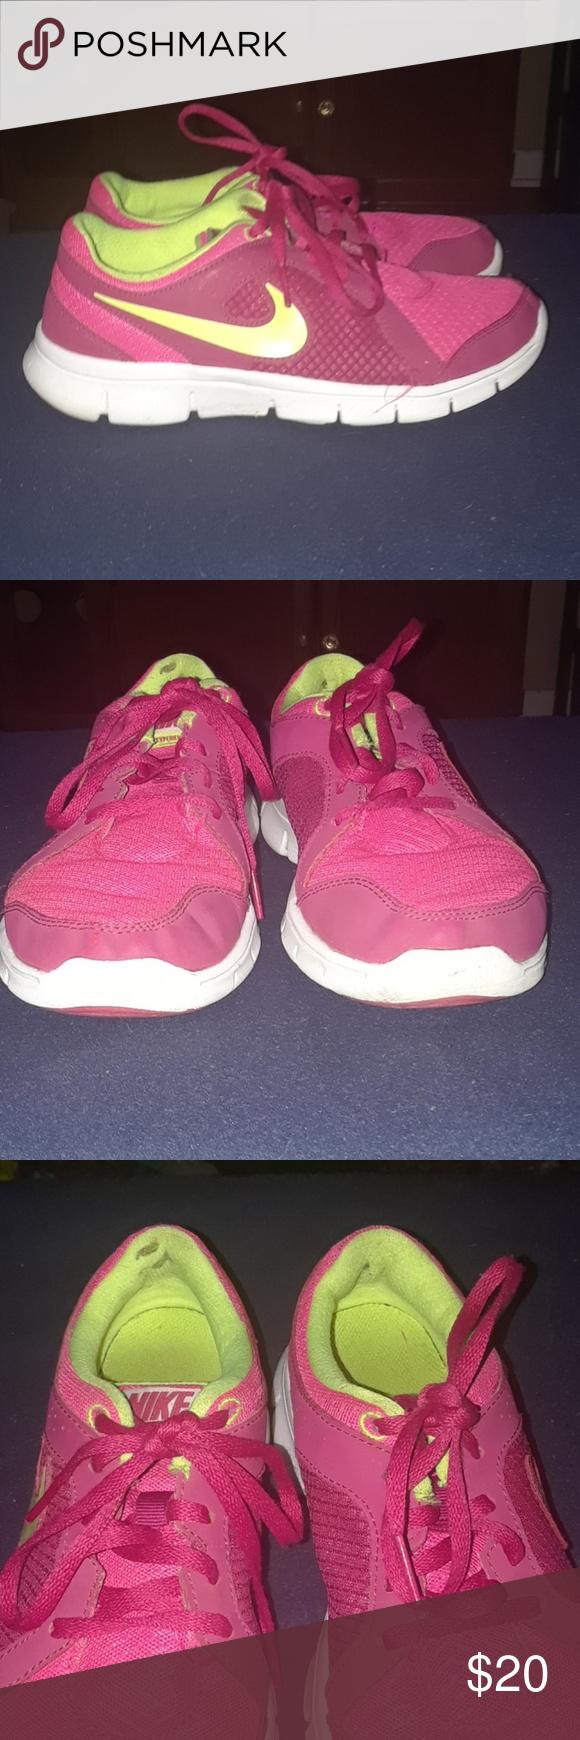 619b78eb6ed0f Pink and neon Nike flex experience RN 2 Nike flex size 6.5W 4.5Y Nike